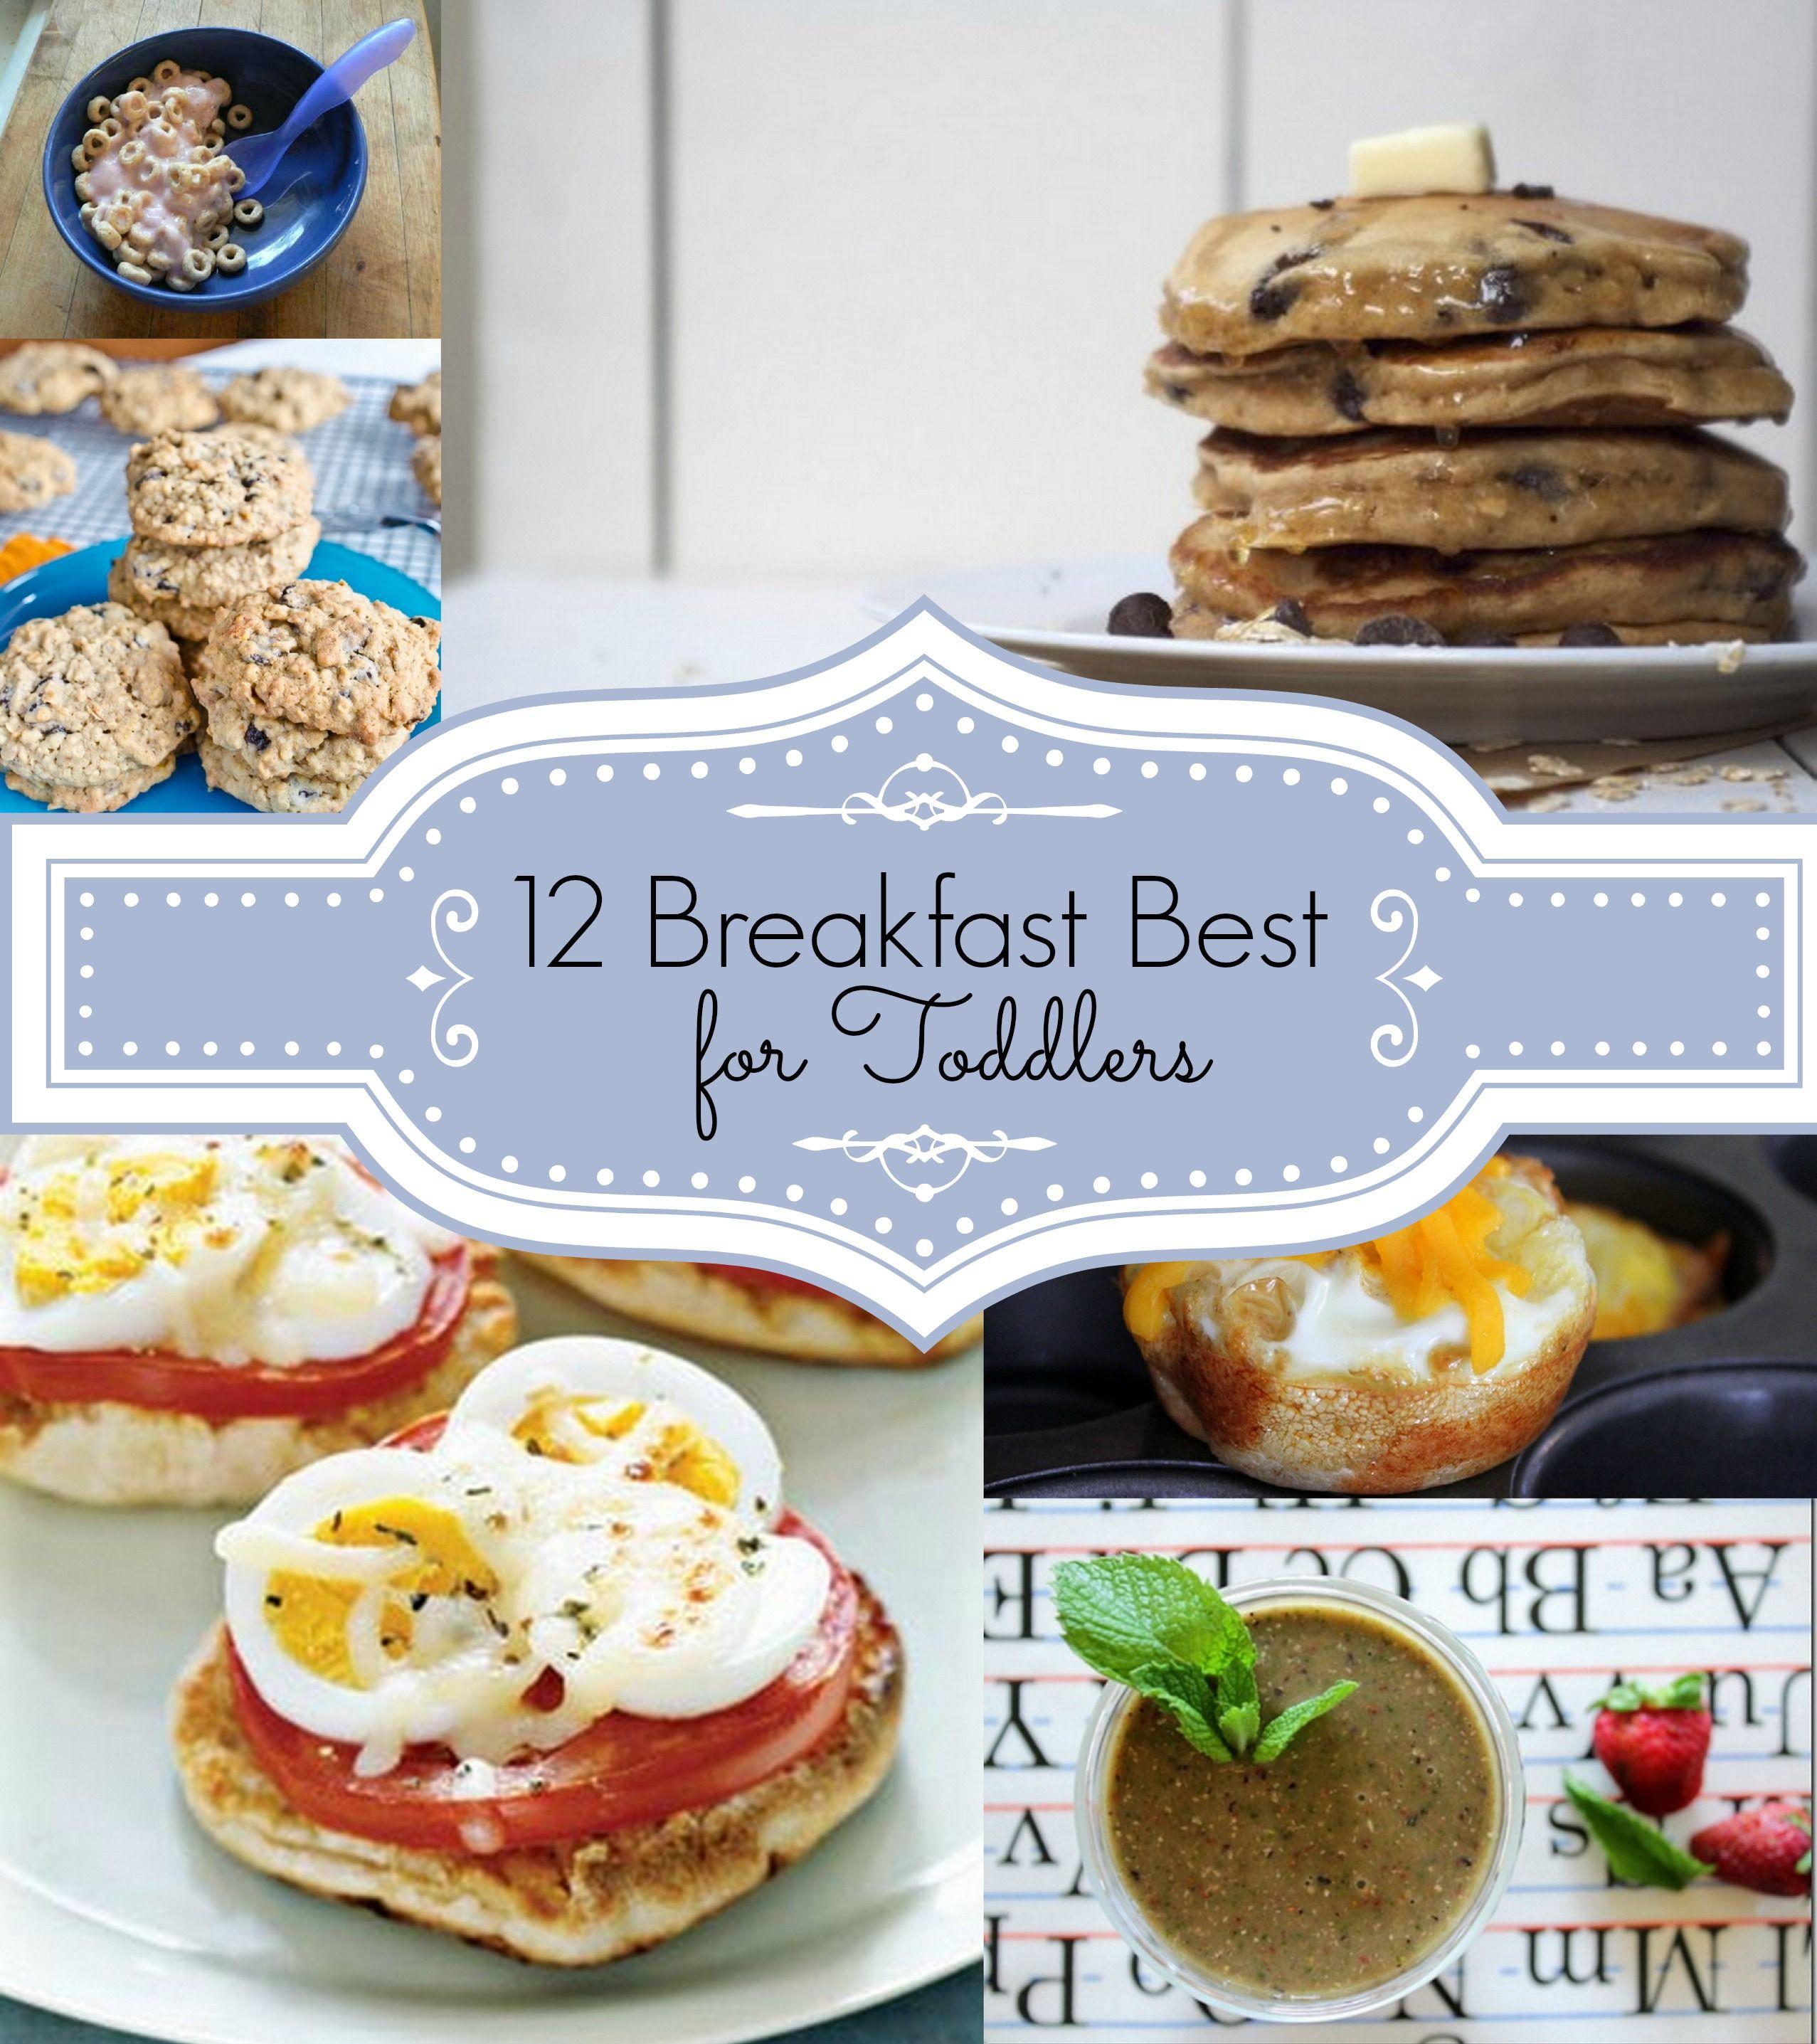 12 Healthy Breakfast Recipes: 12 Healthy, Breakfast Best For Toddlers